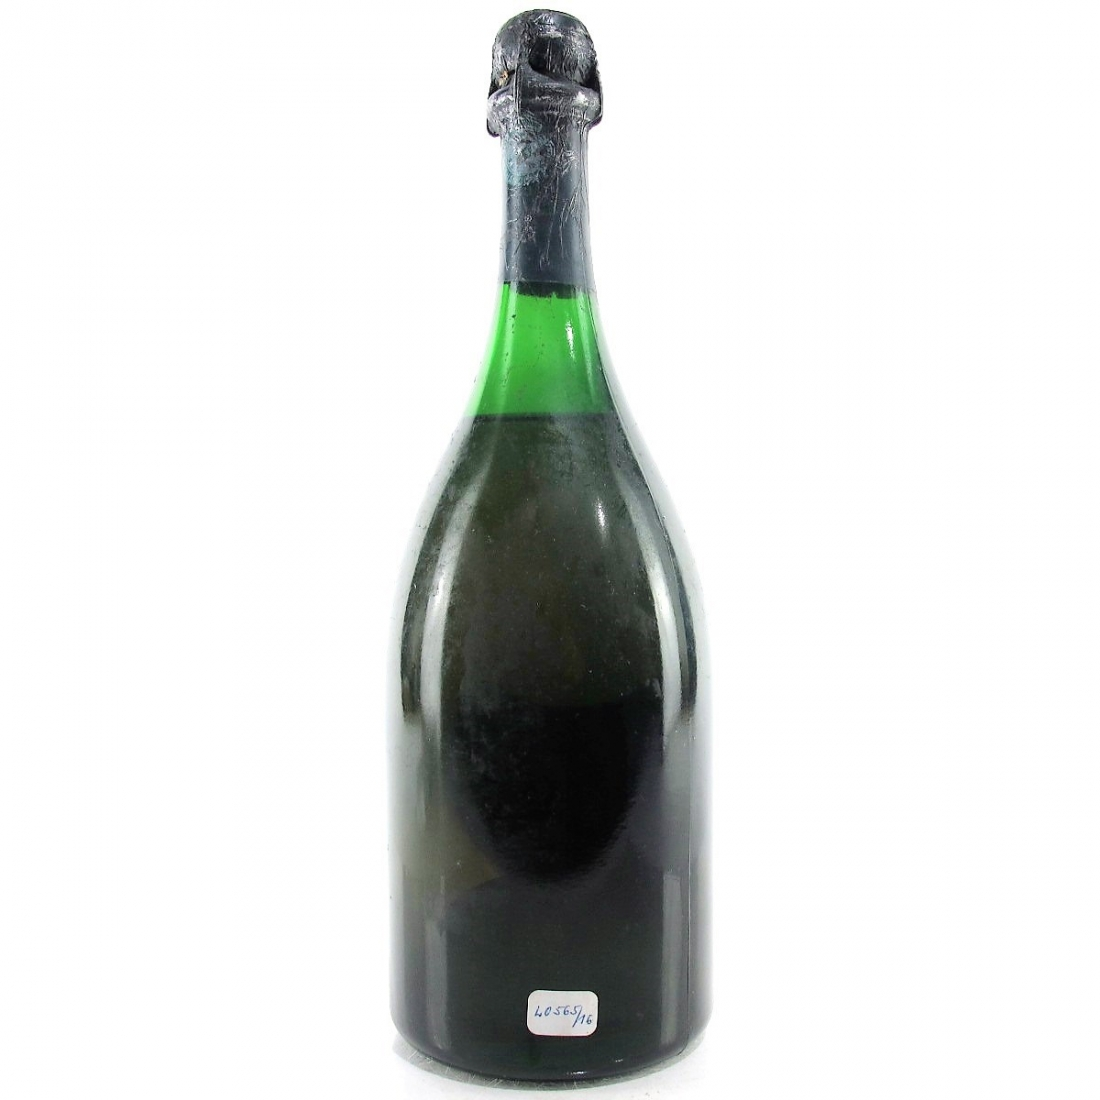 Dom Perignon Brut Vintage 1962 Champagne